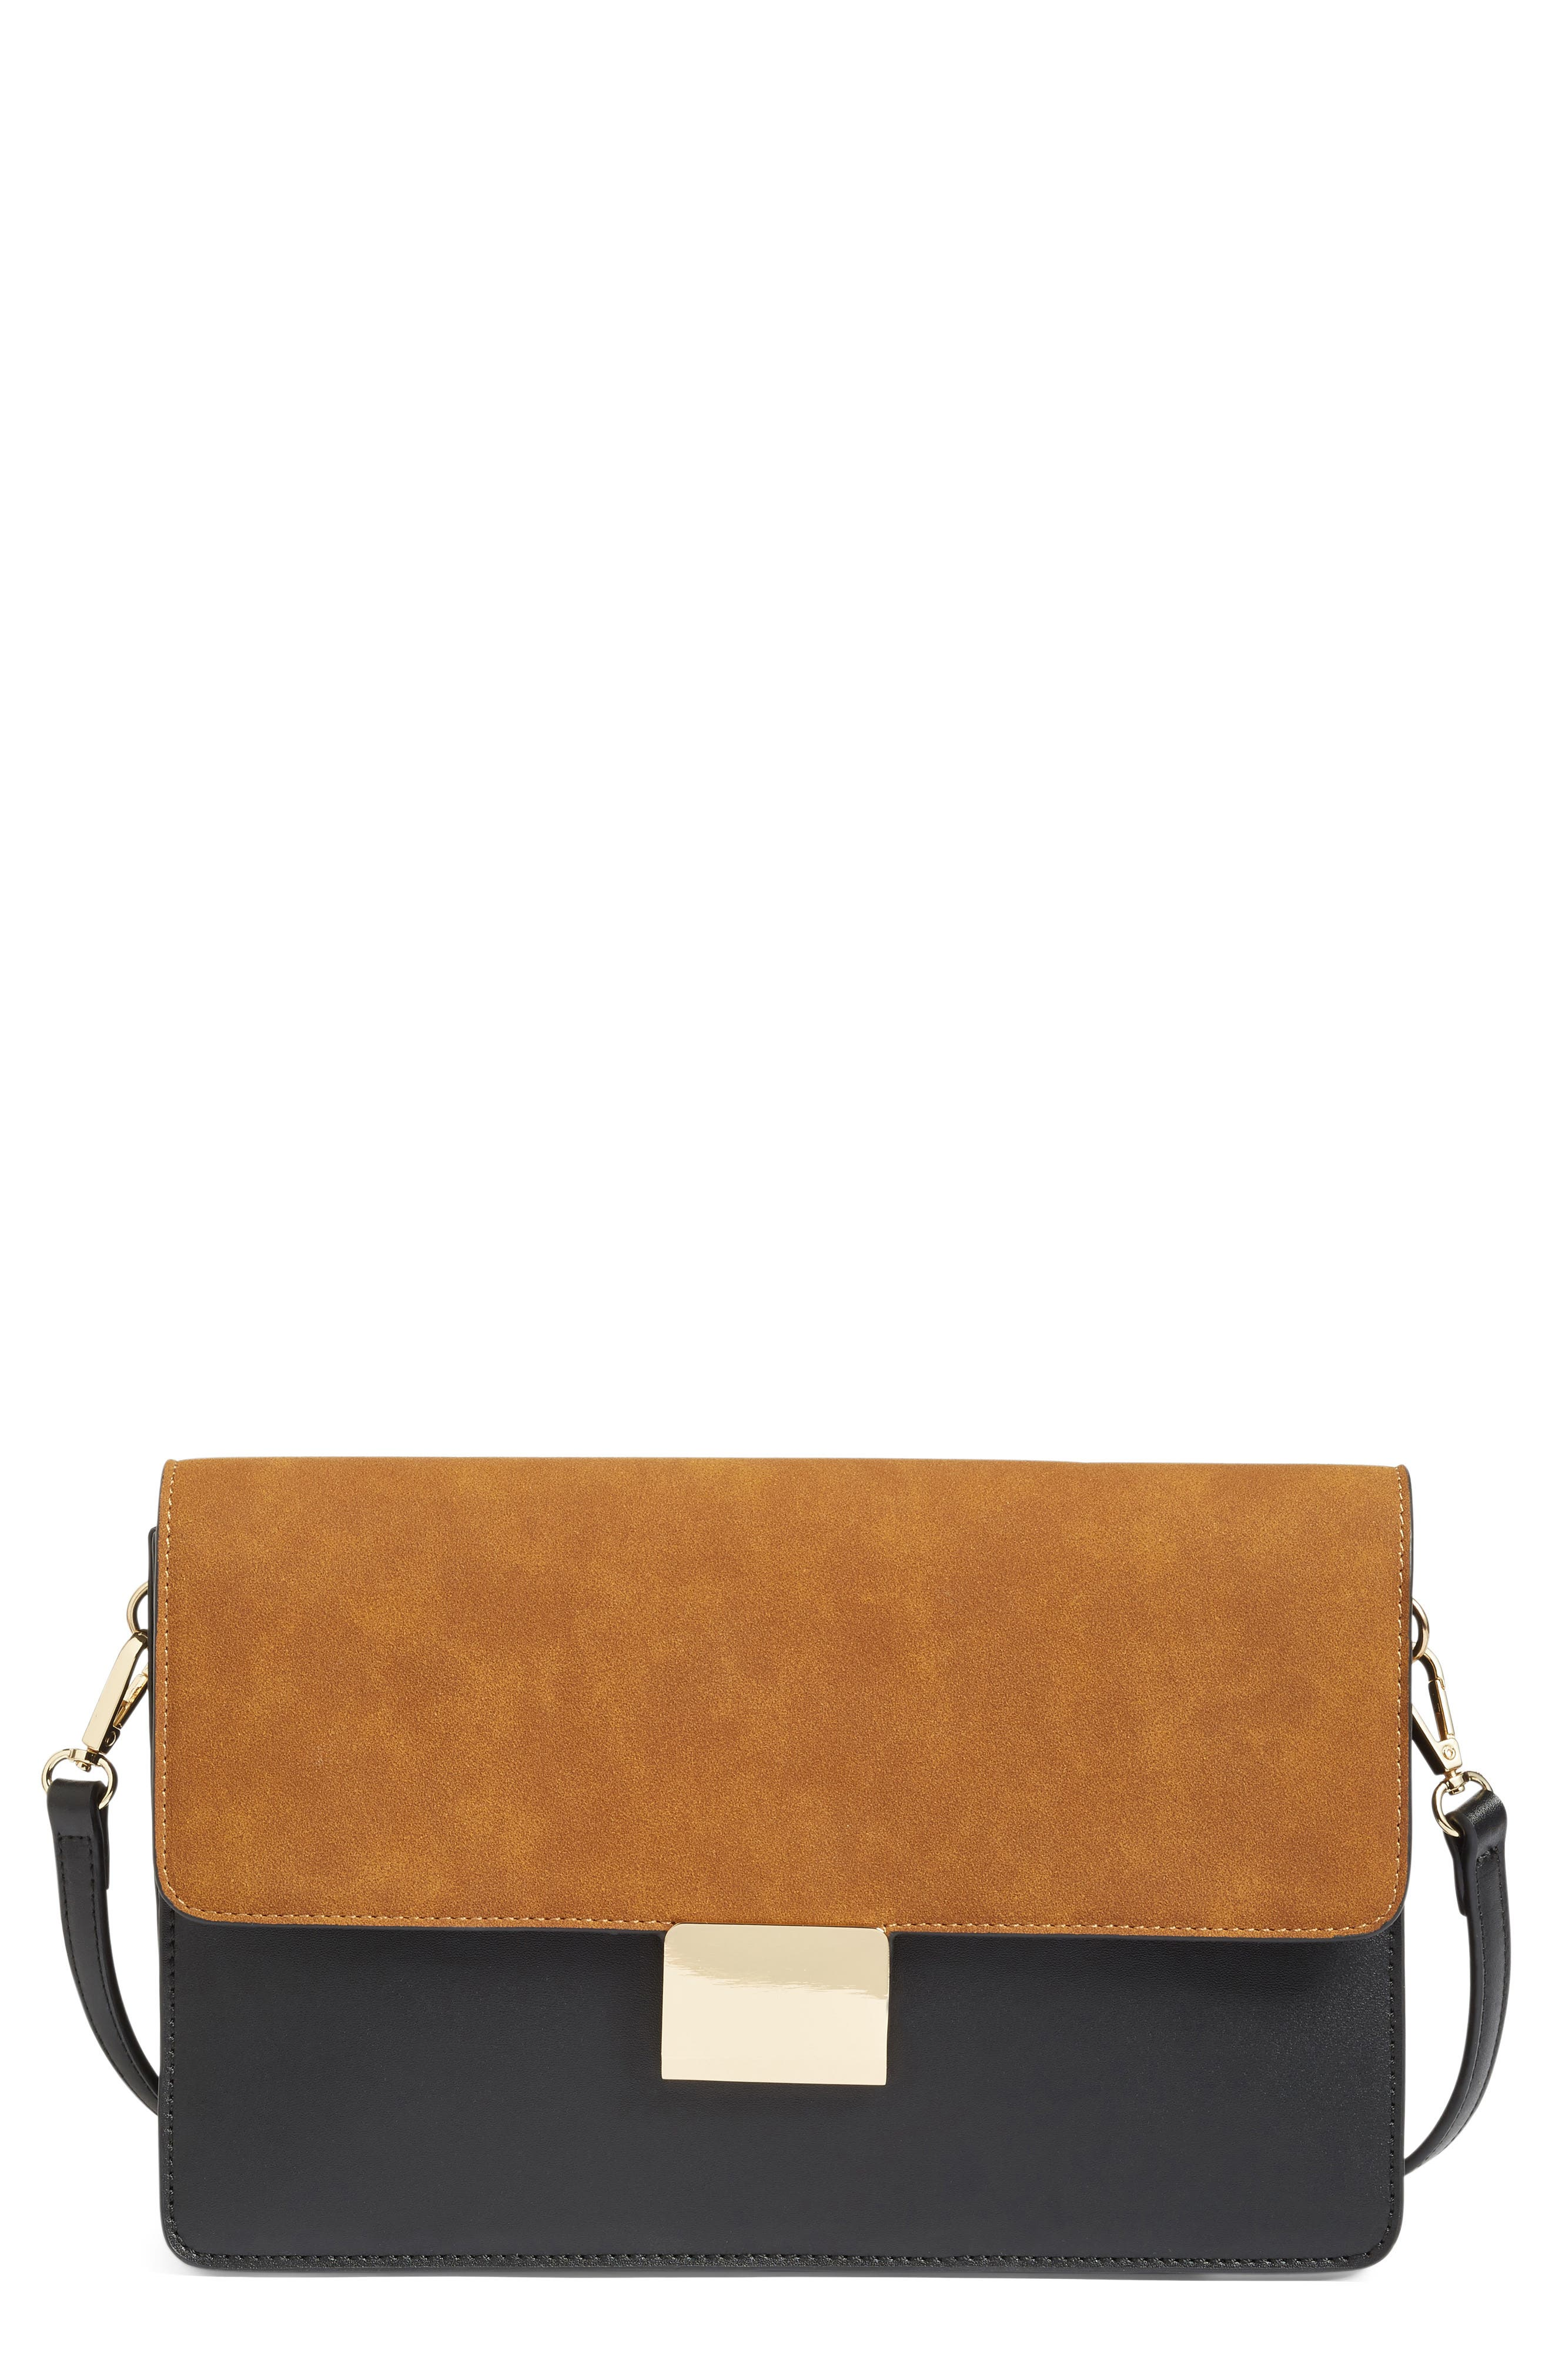 Leighton Colorblock Faux Leather Crossbody Bag,                         Main,                         color, Black/Cognac